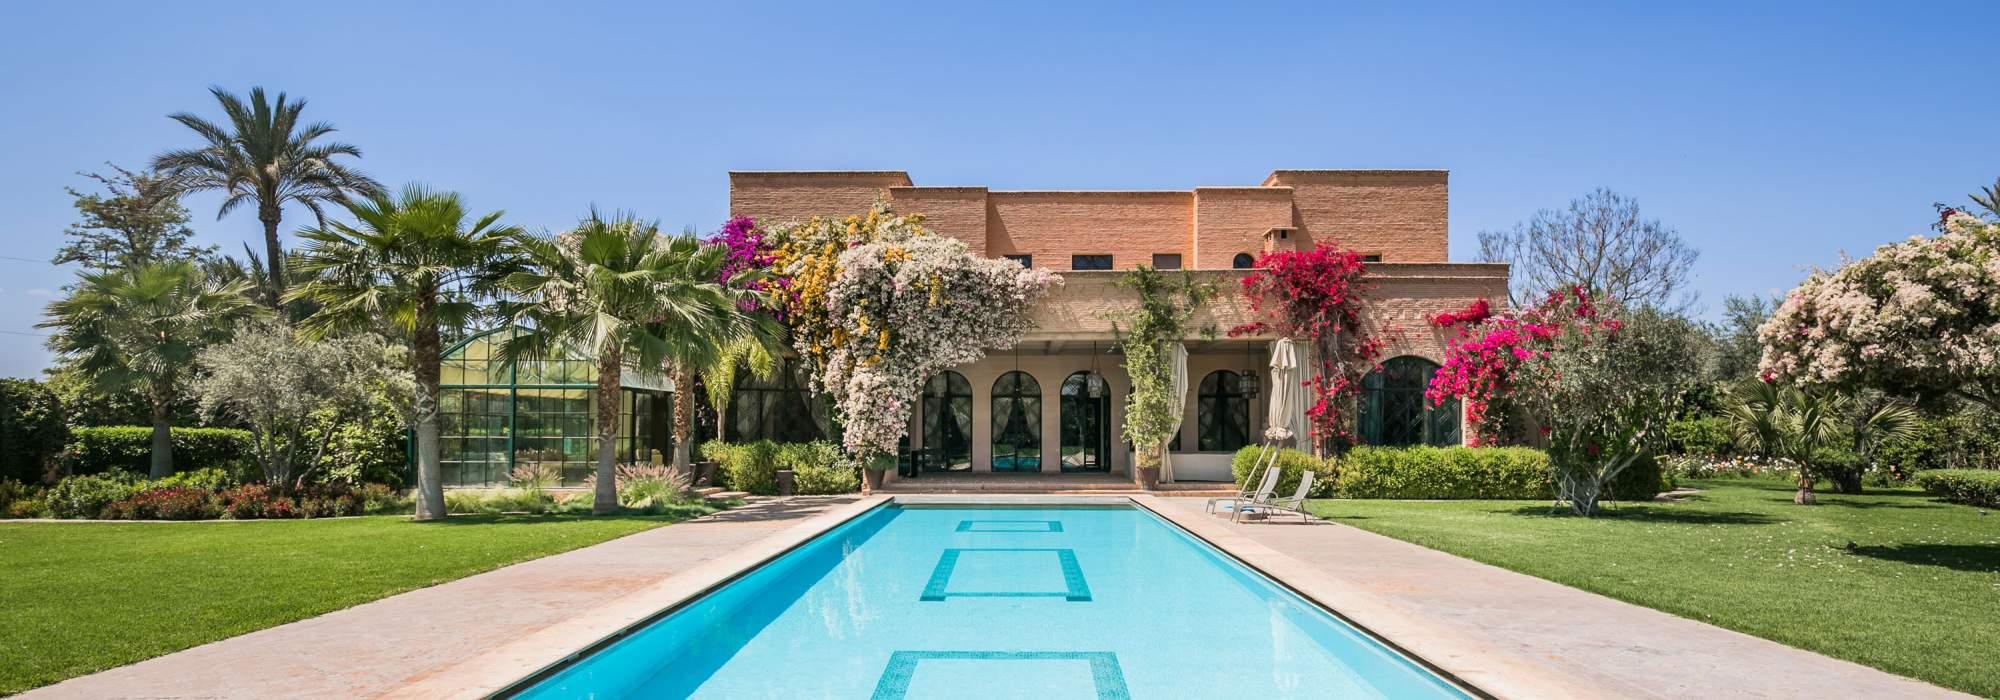 Villa de luxe a vendre Marrakech proche des golfs .